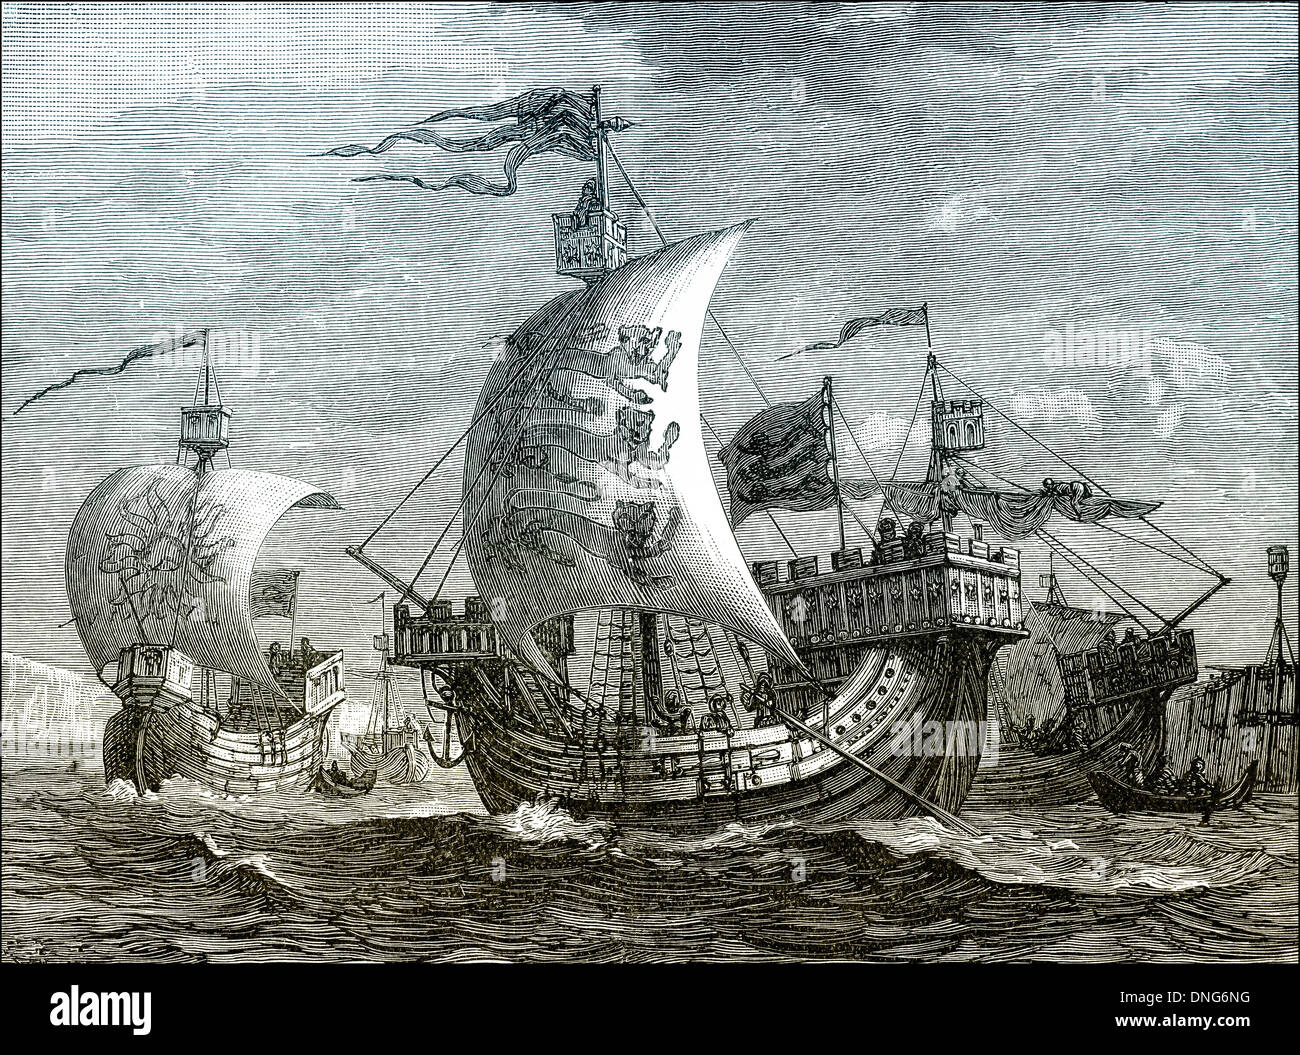 English ships, 14th century - Stock Image